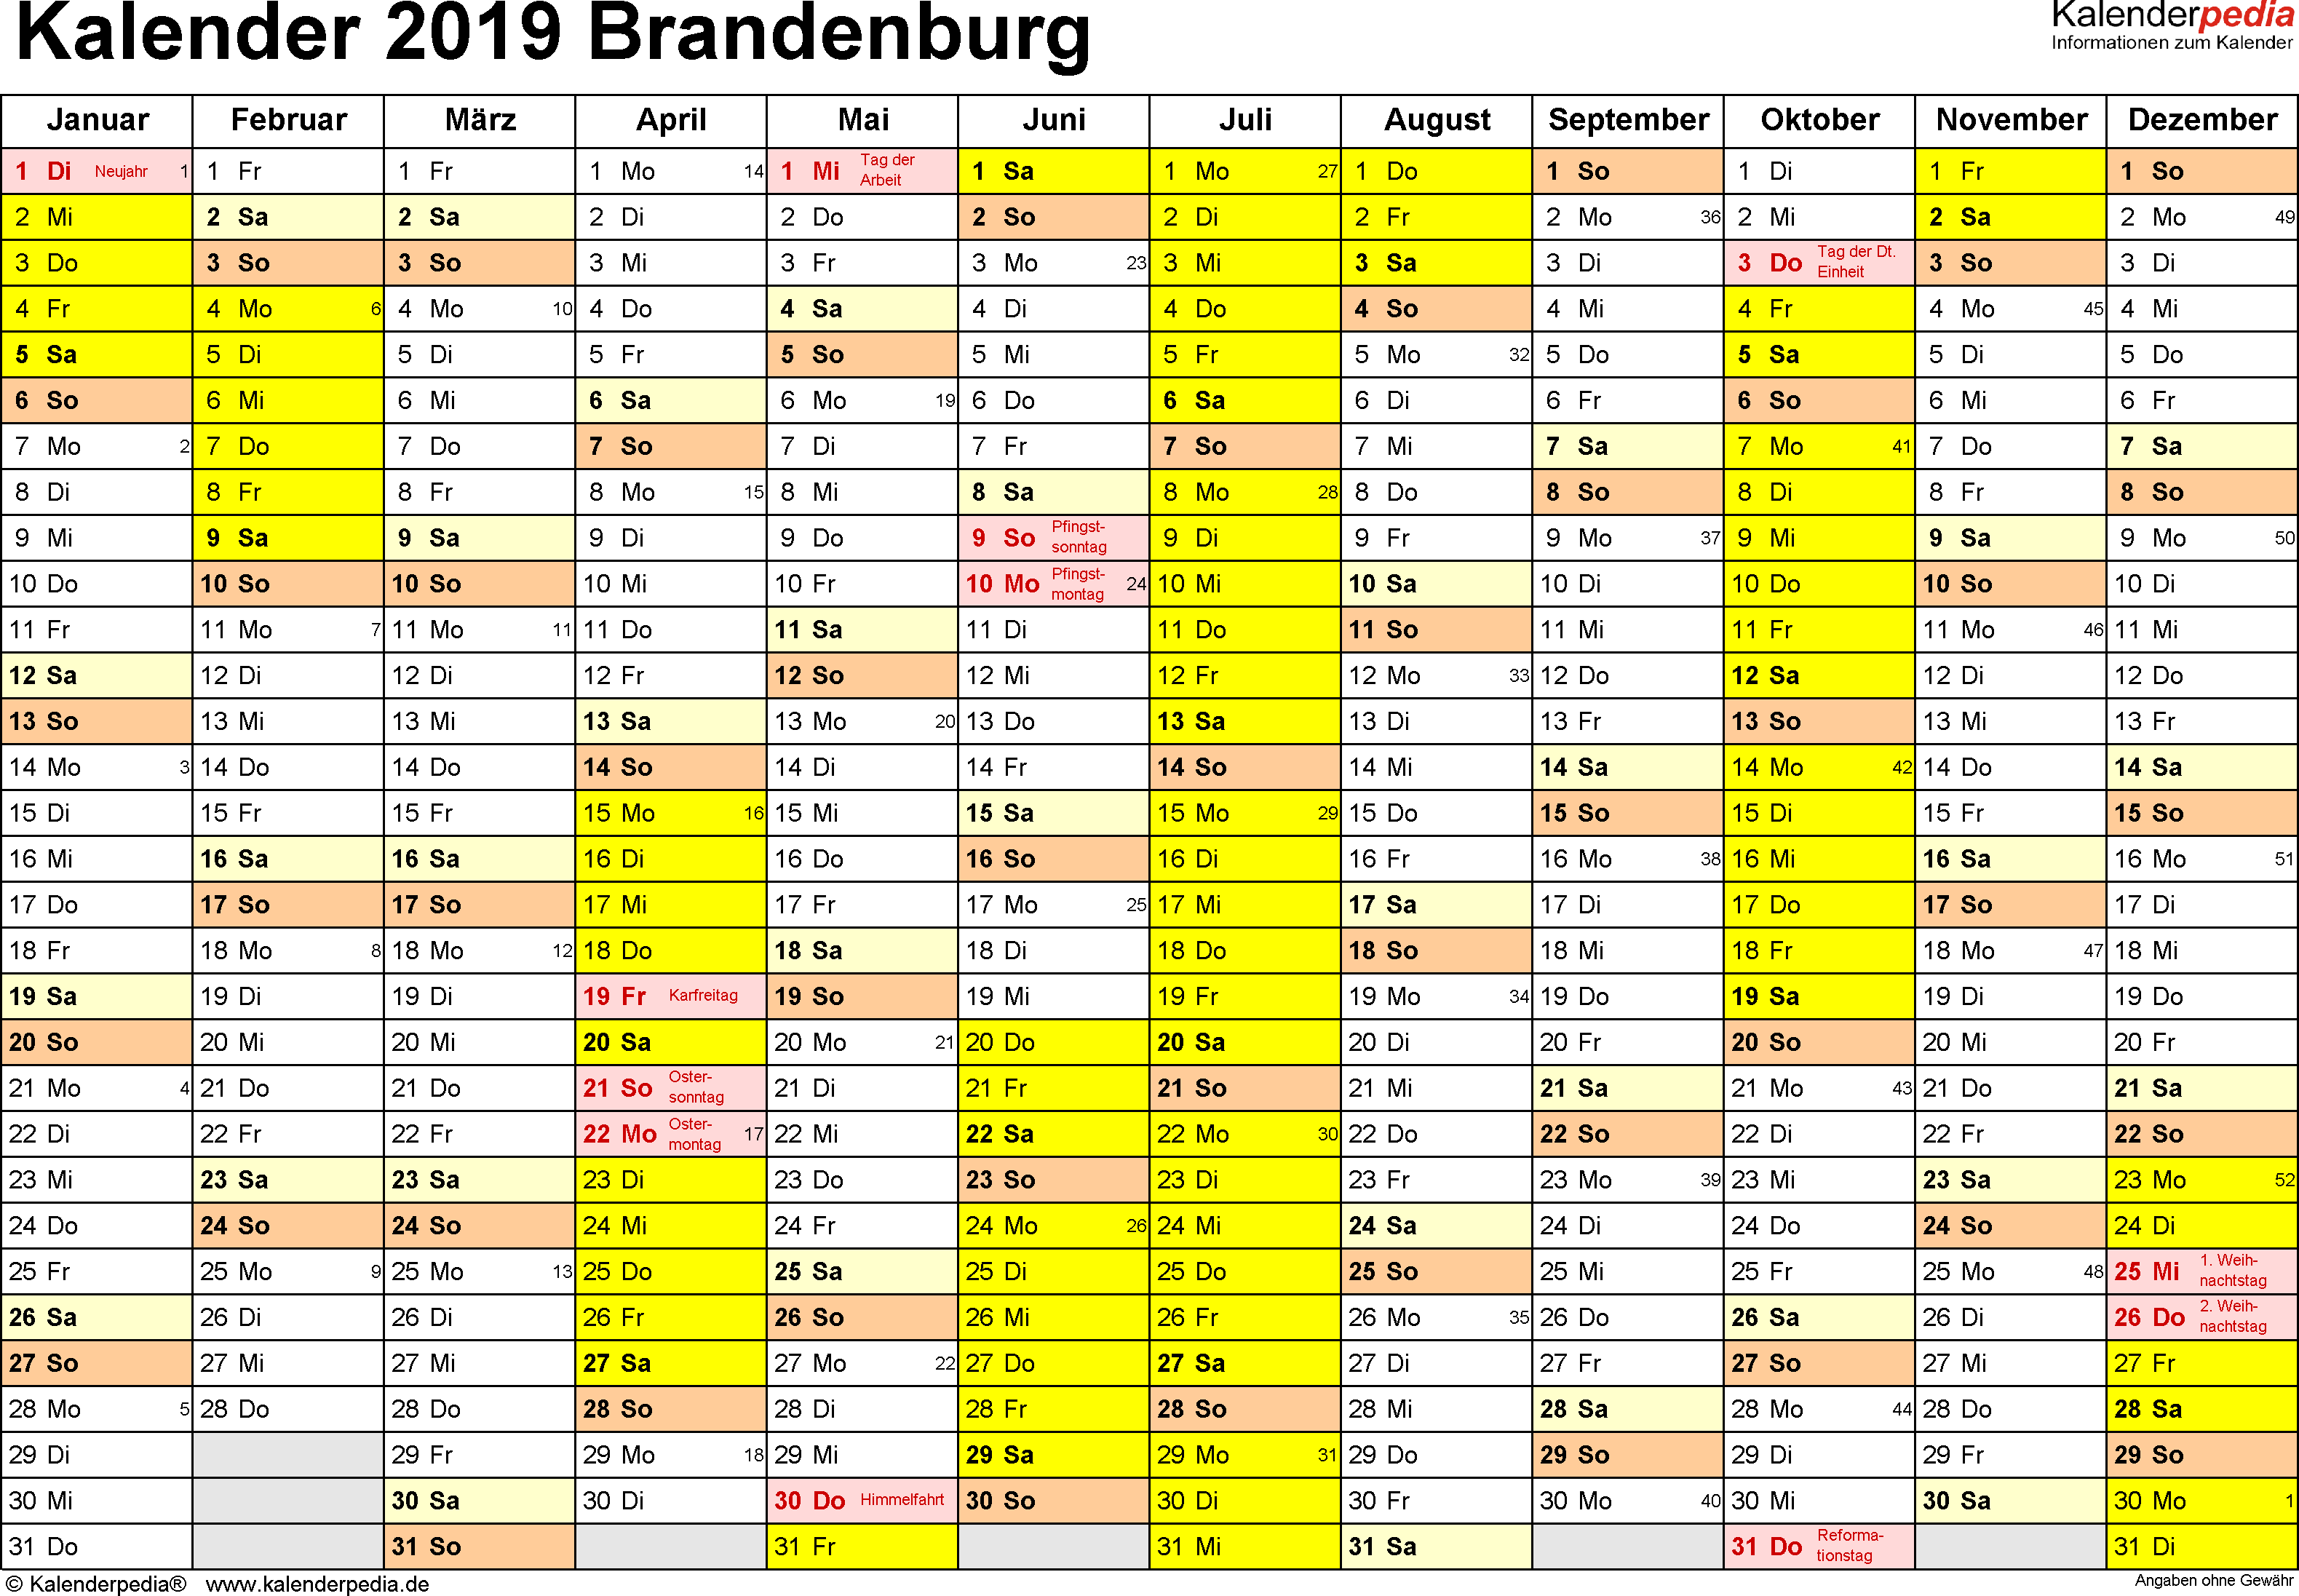 Kalender 2019 Brandenburg